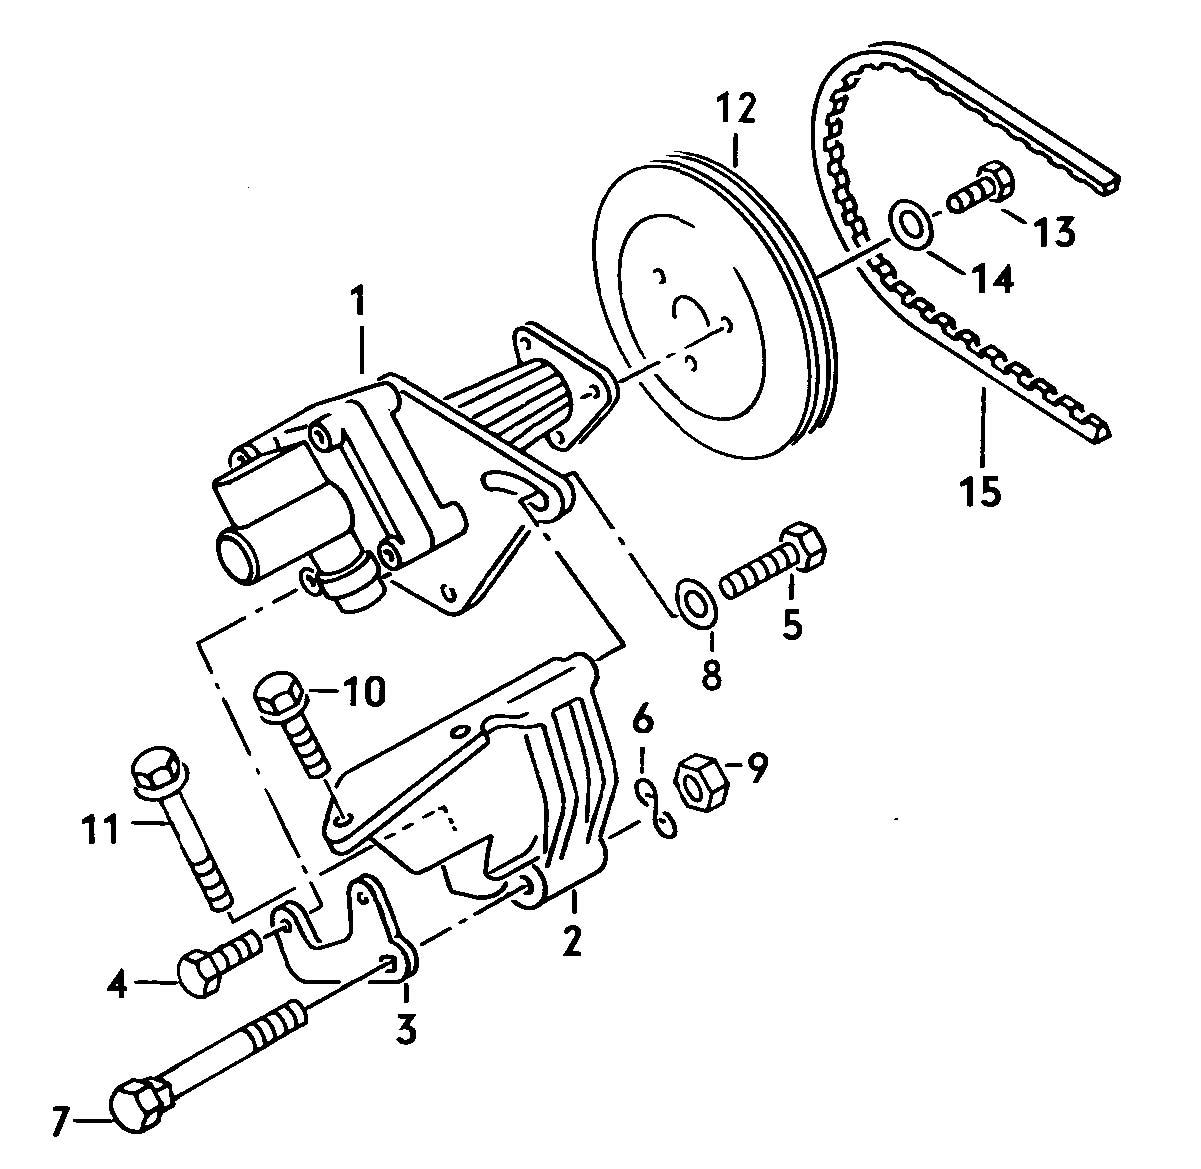 Volkswagen Vw Vanagon Hydraulic Pump For Power Steering 1 9ltr 2 1ltr